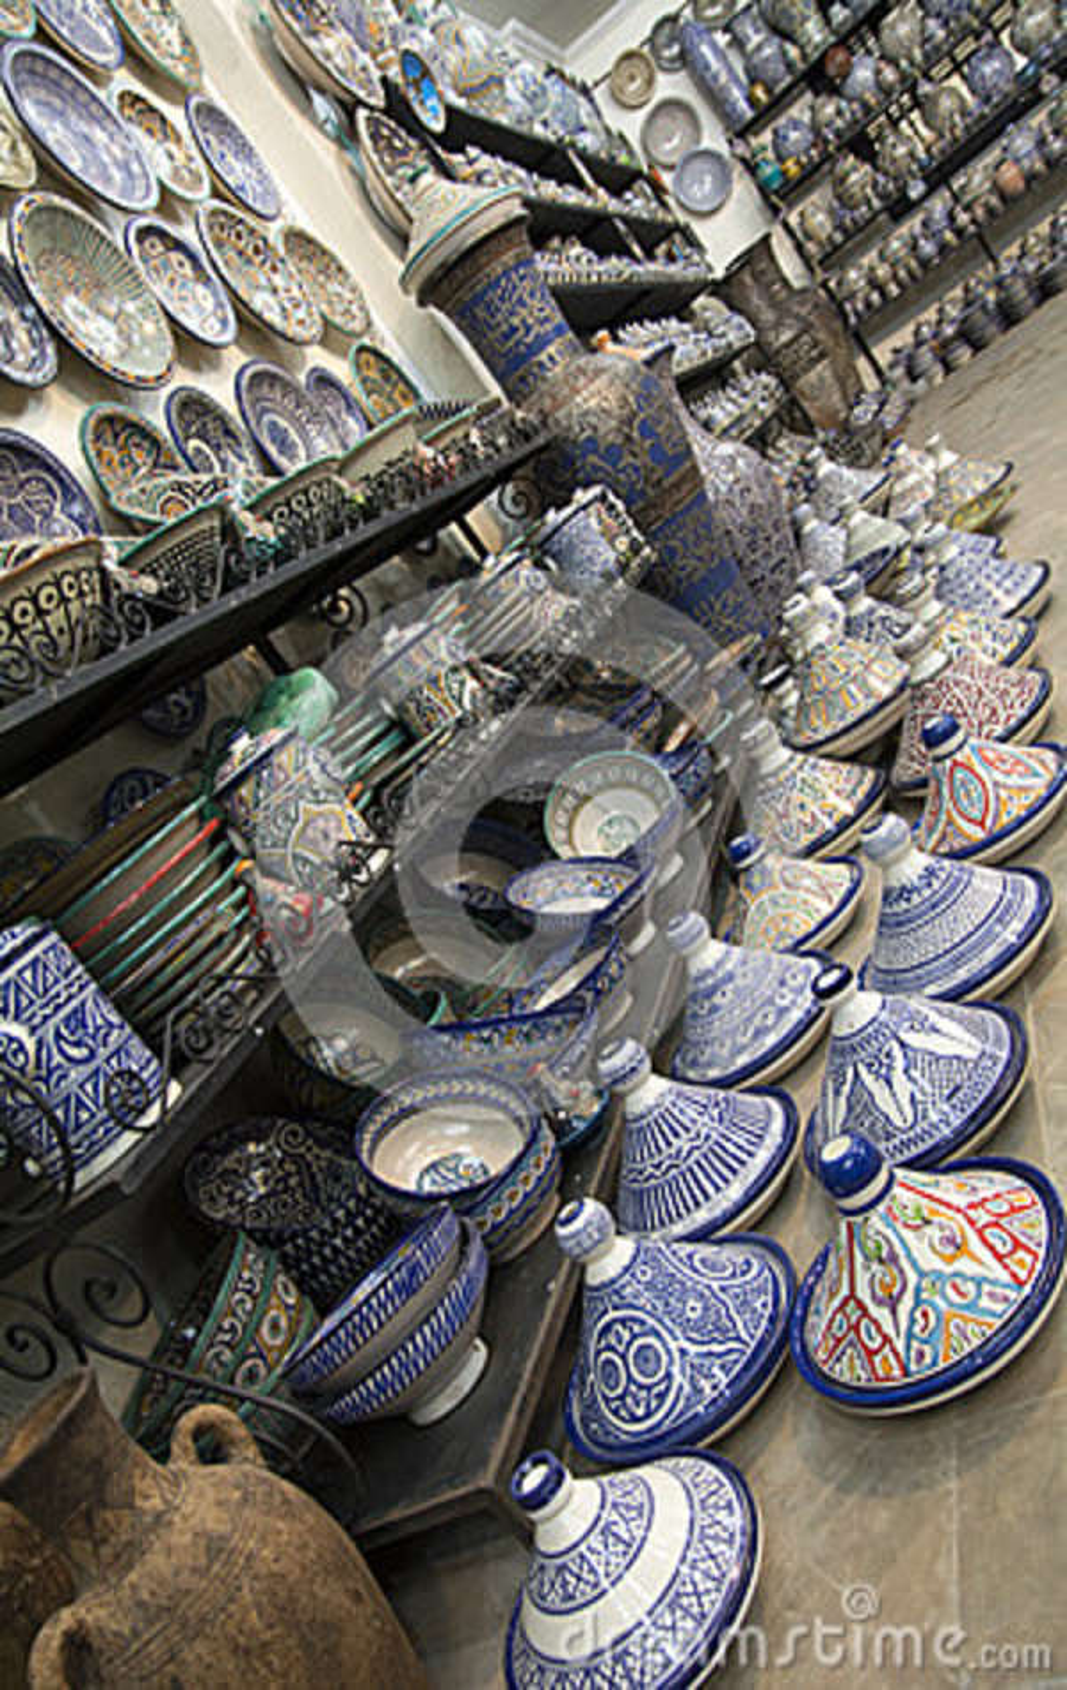 Fez Marrocos África cerâmica marroquina azul